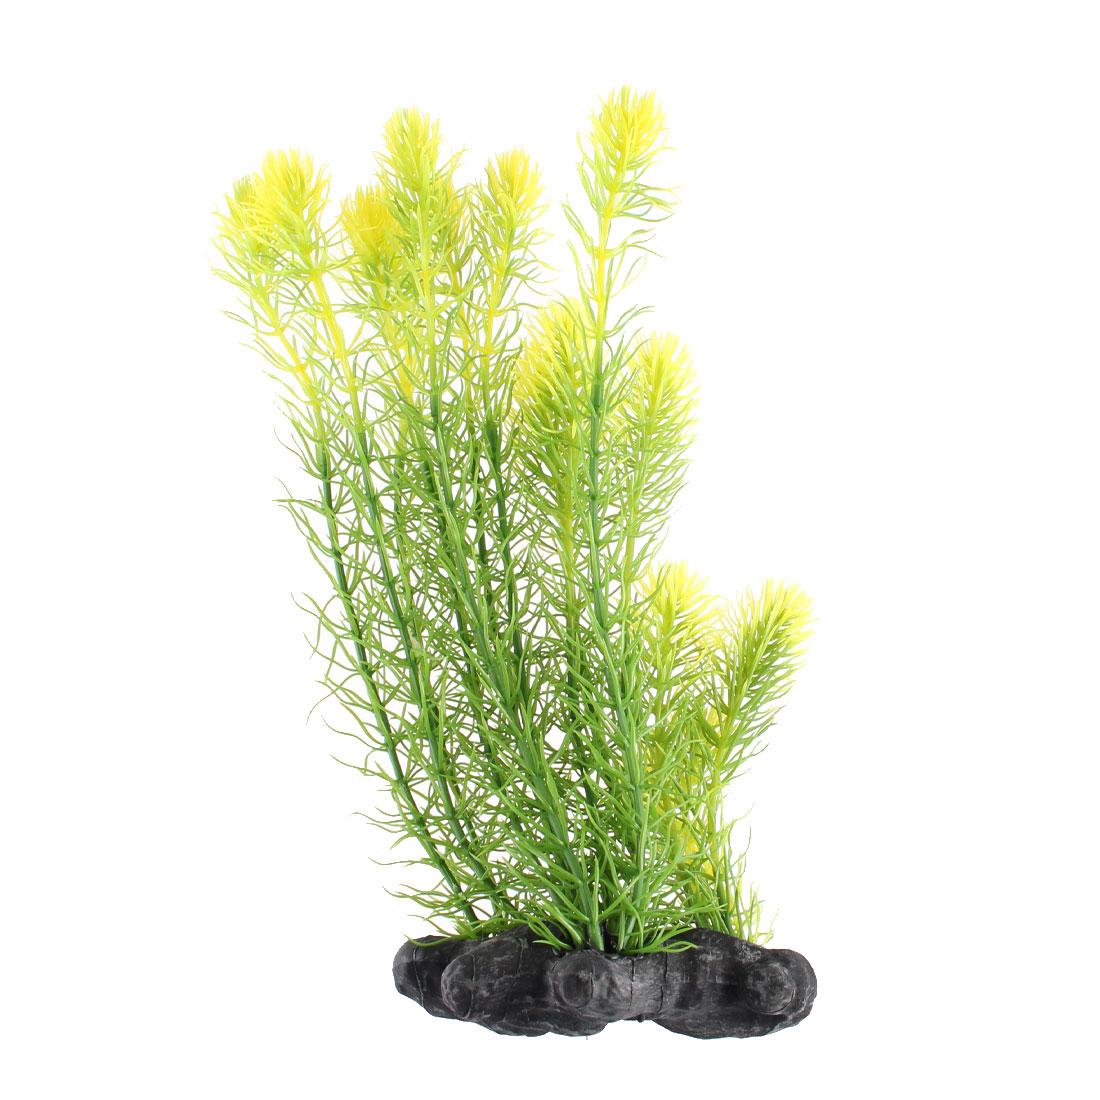 Aquarium Fish Tank Plastic Artificial Plant Grass Green Yellow 32cm Height